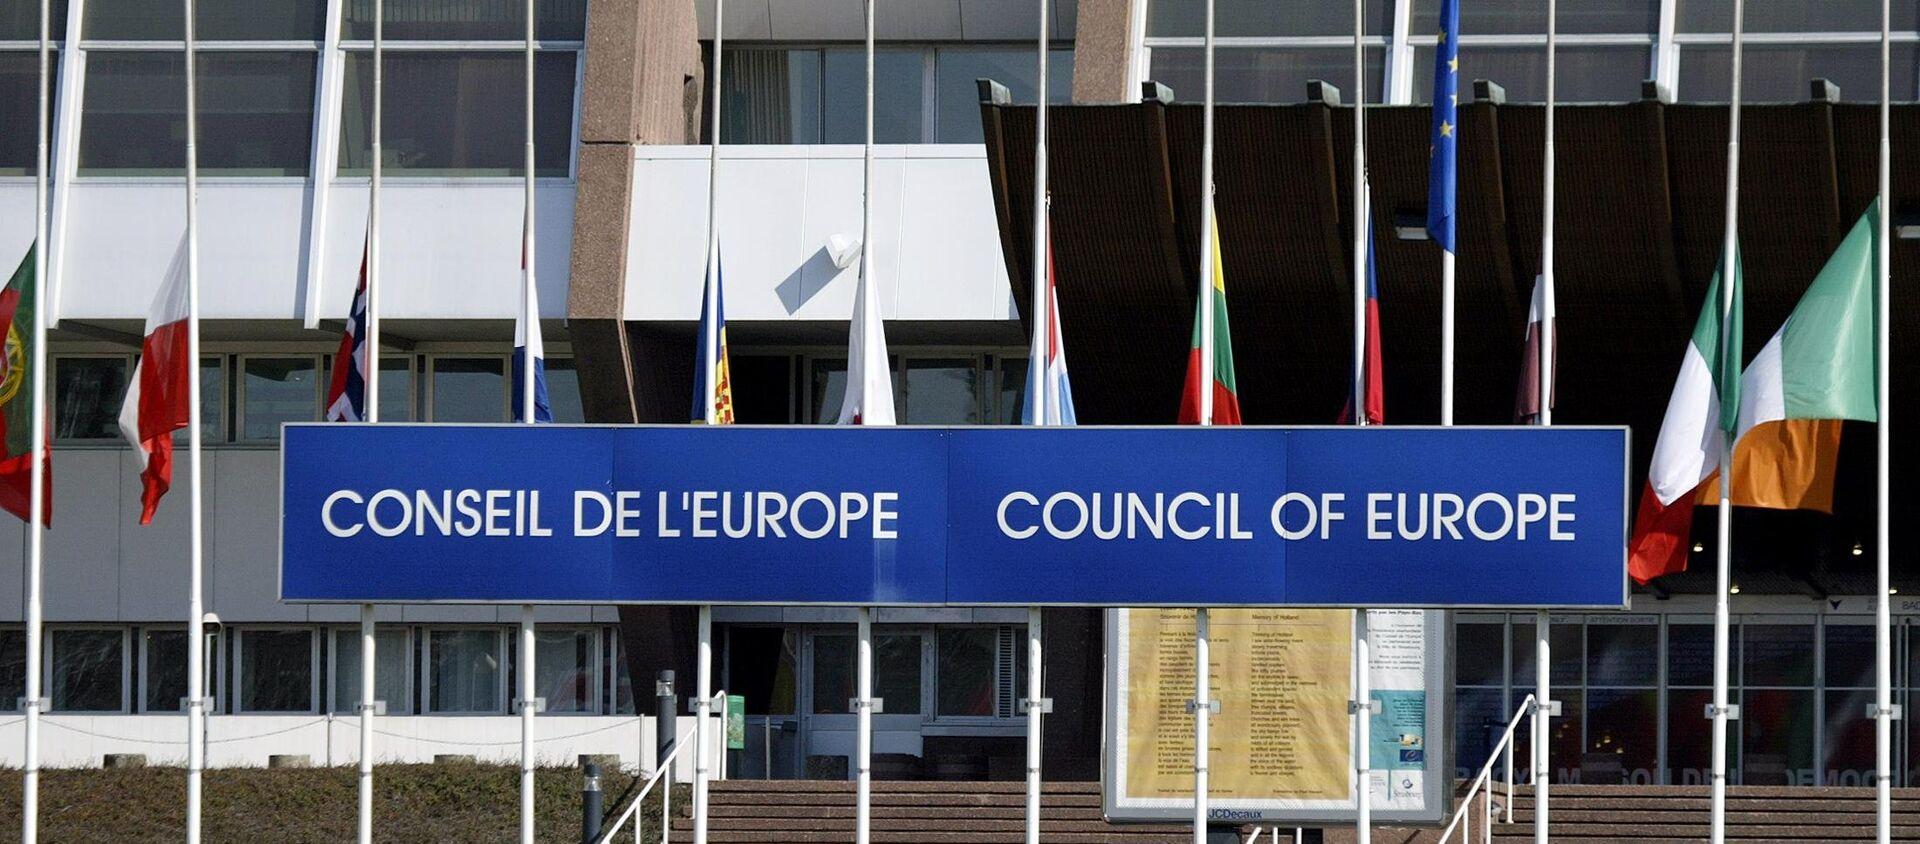 Consejo de Europa - Sputnik Mundo, 1920, 20.06.2018